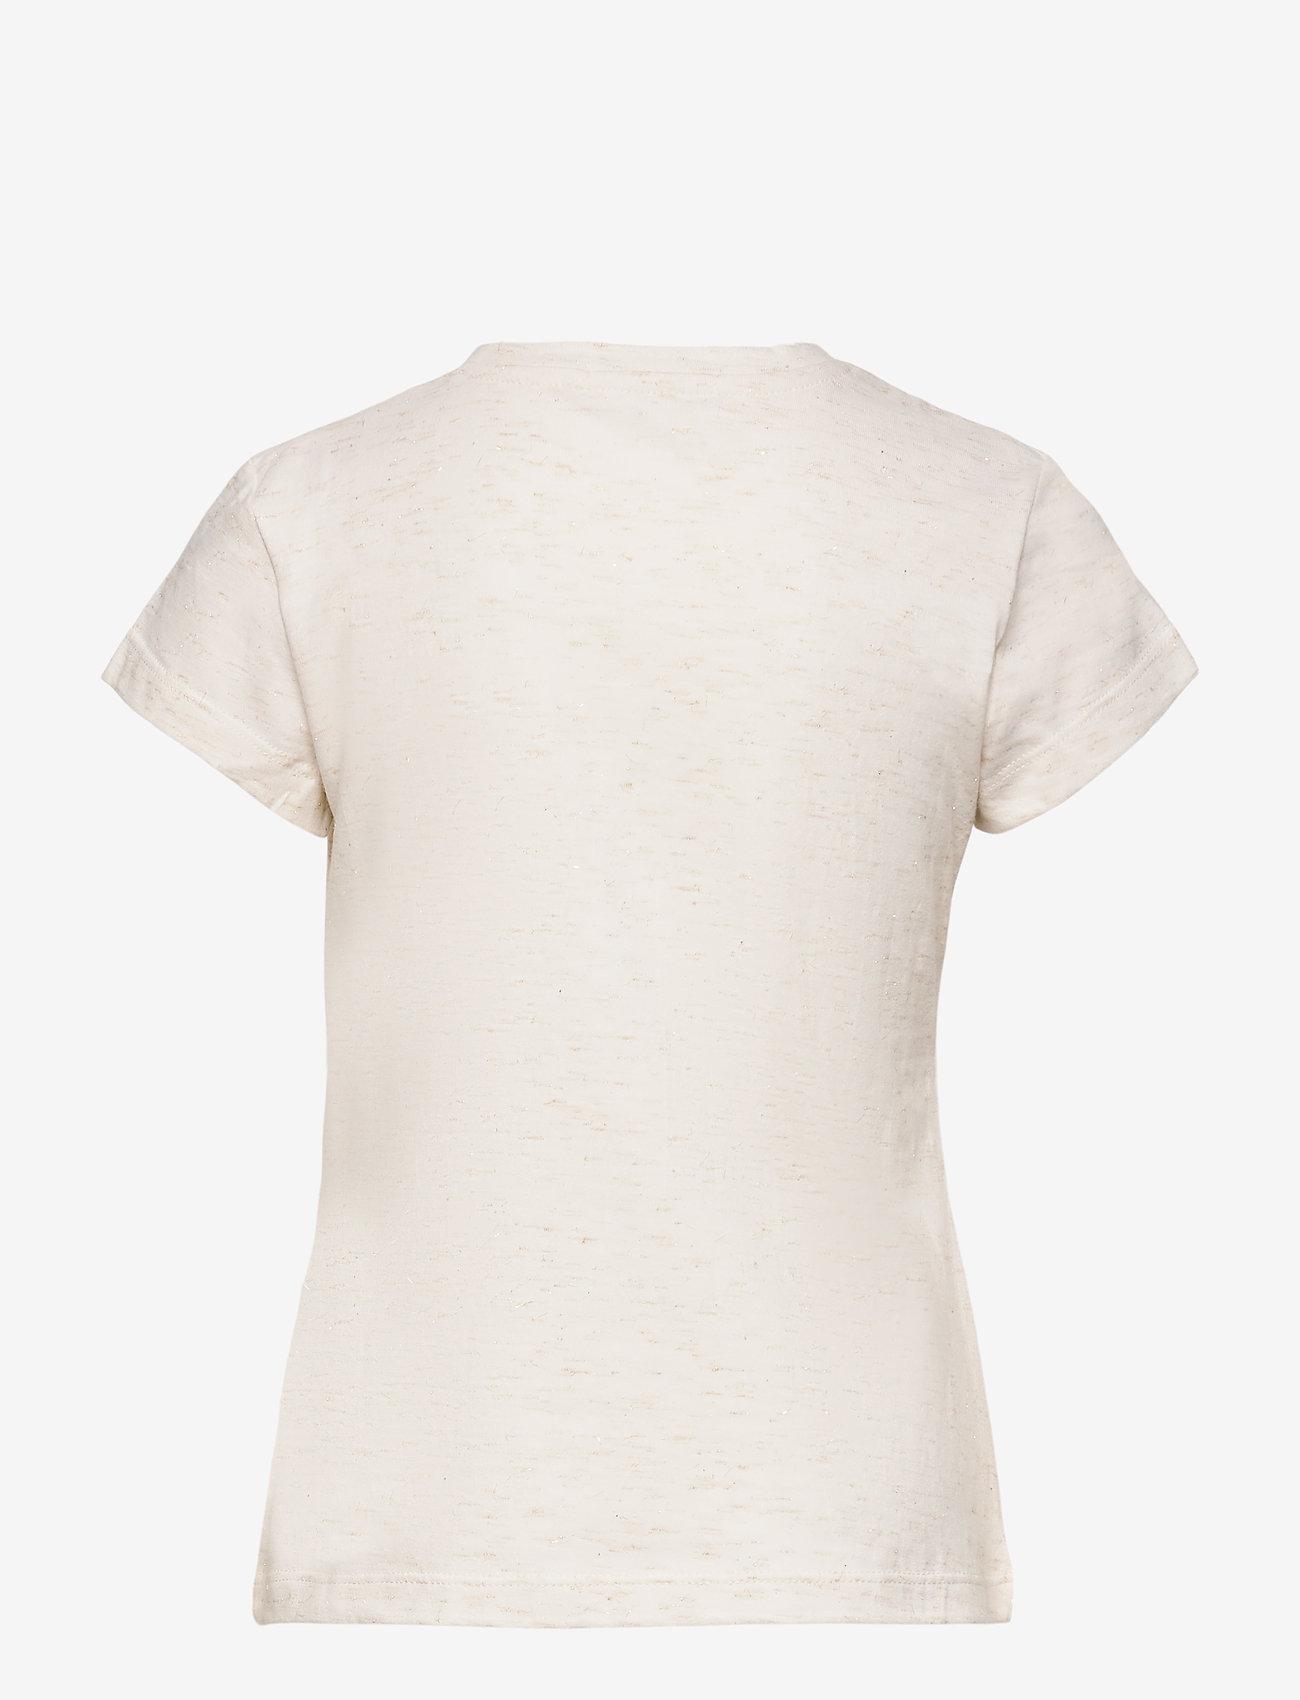 Calvin Klein - OVERLAPPING MONOGRAM T-SHIRT - t-shirts - bright white - 1